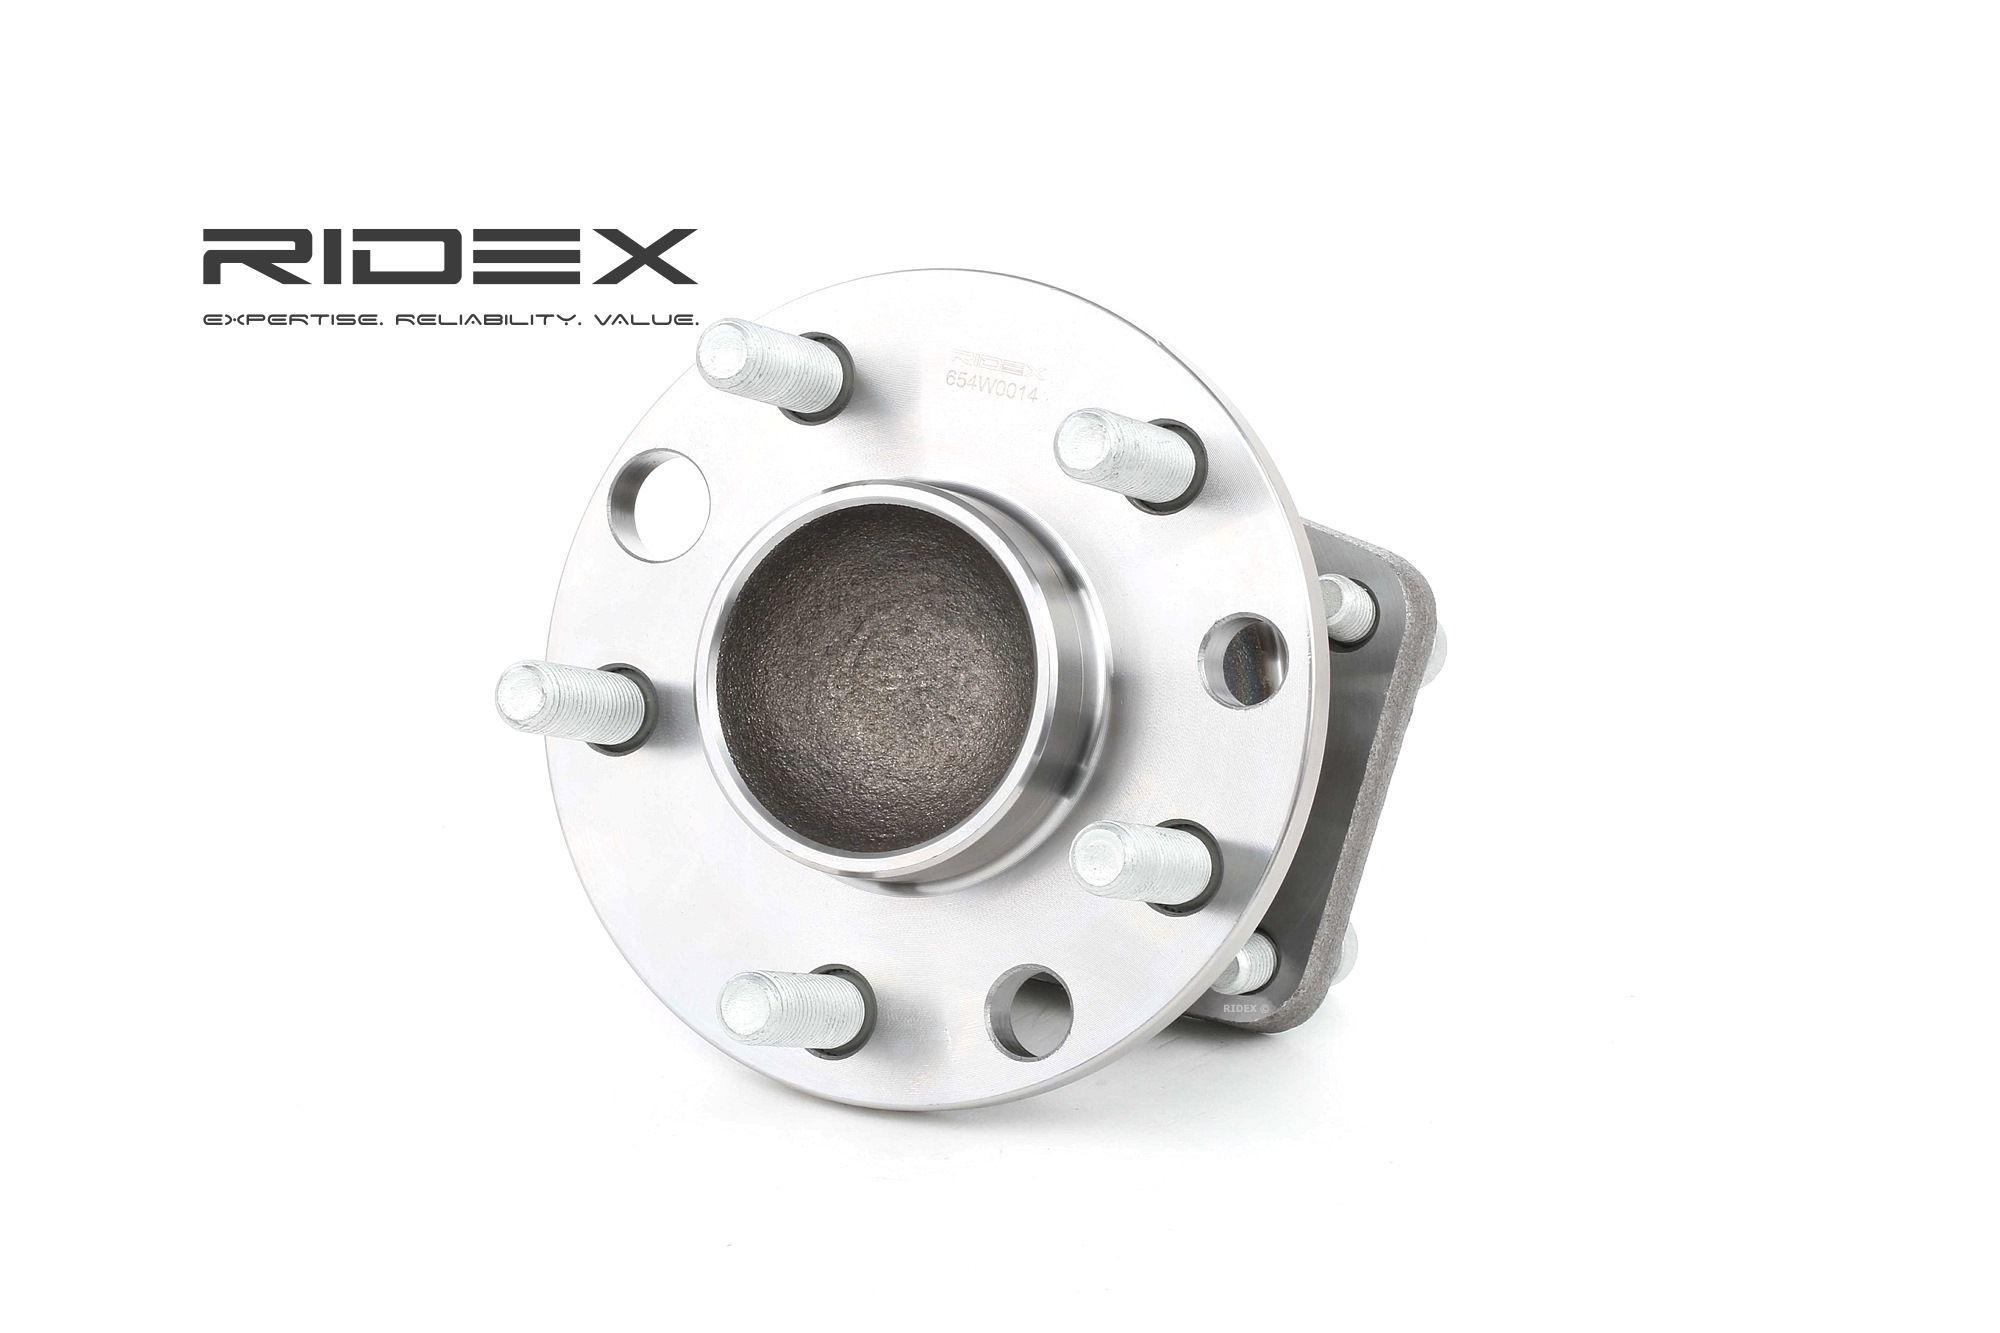 Origine Suspension et bras RIDEX 654W0014 (Ø: 136mm)